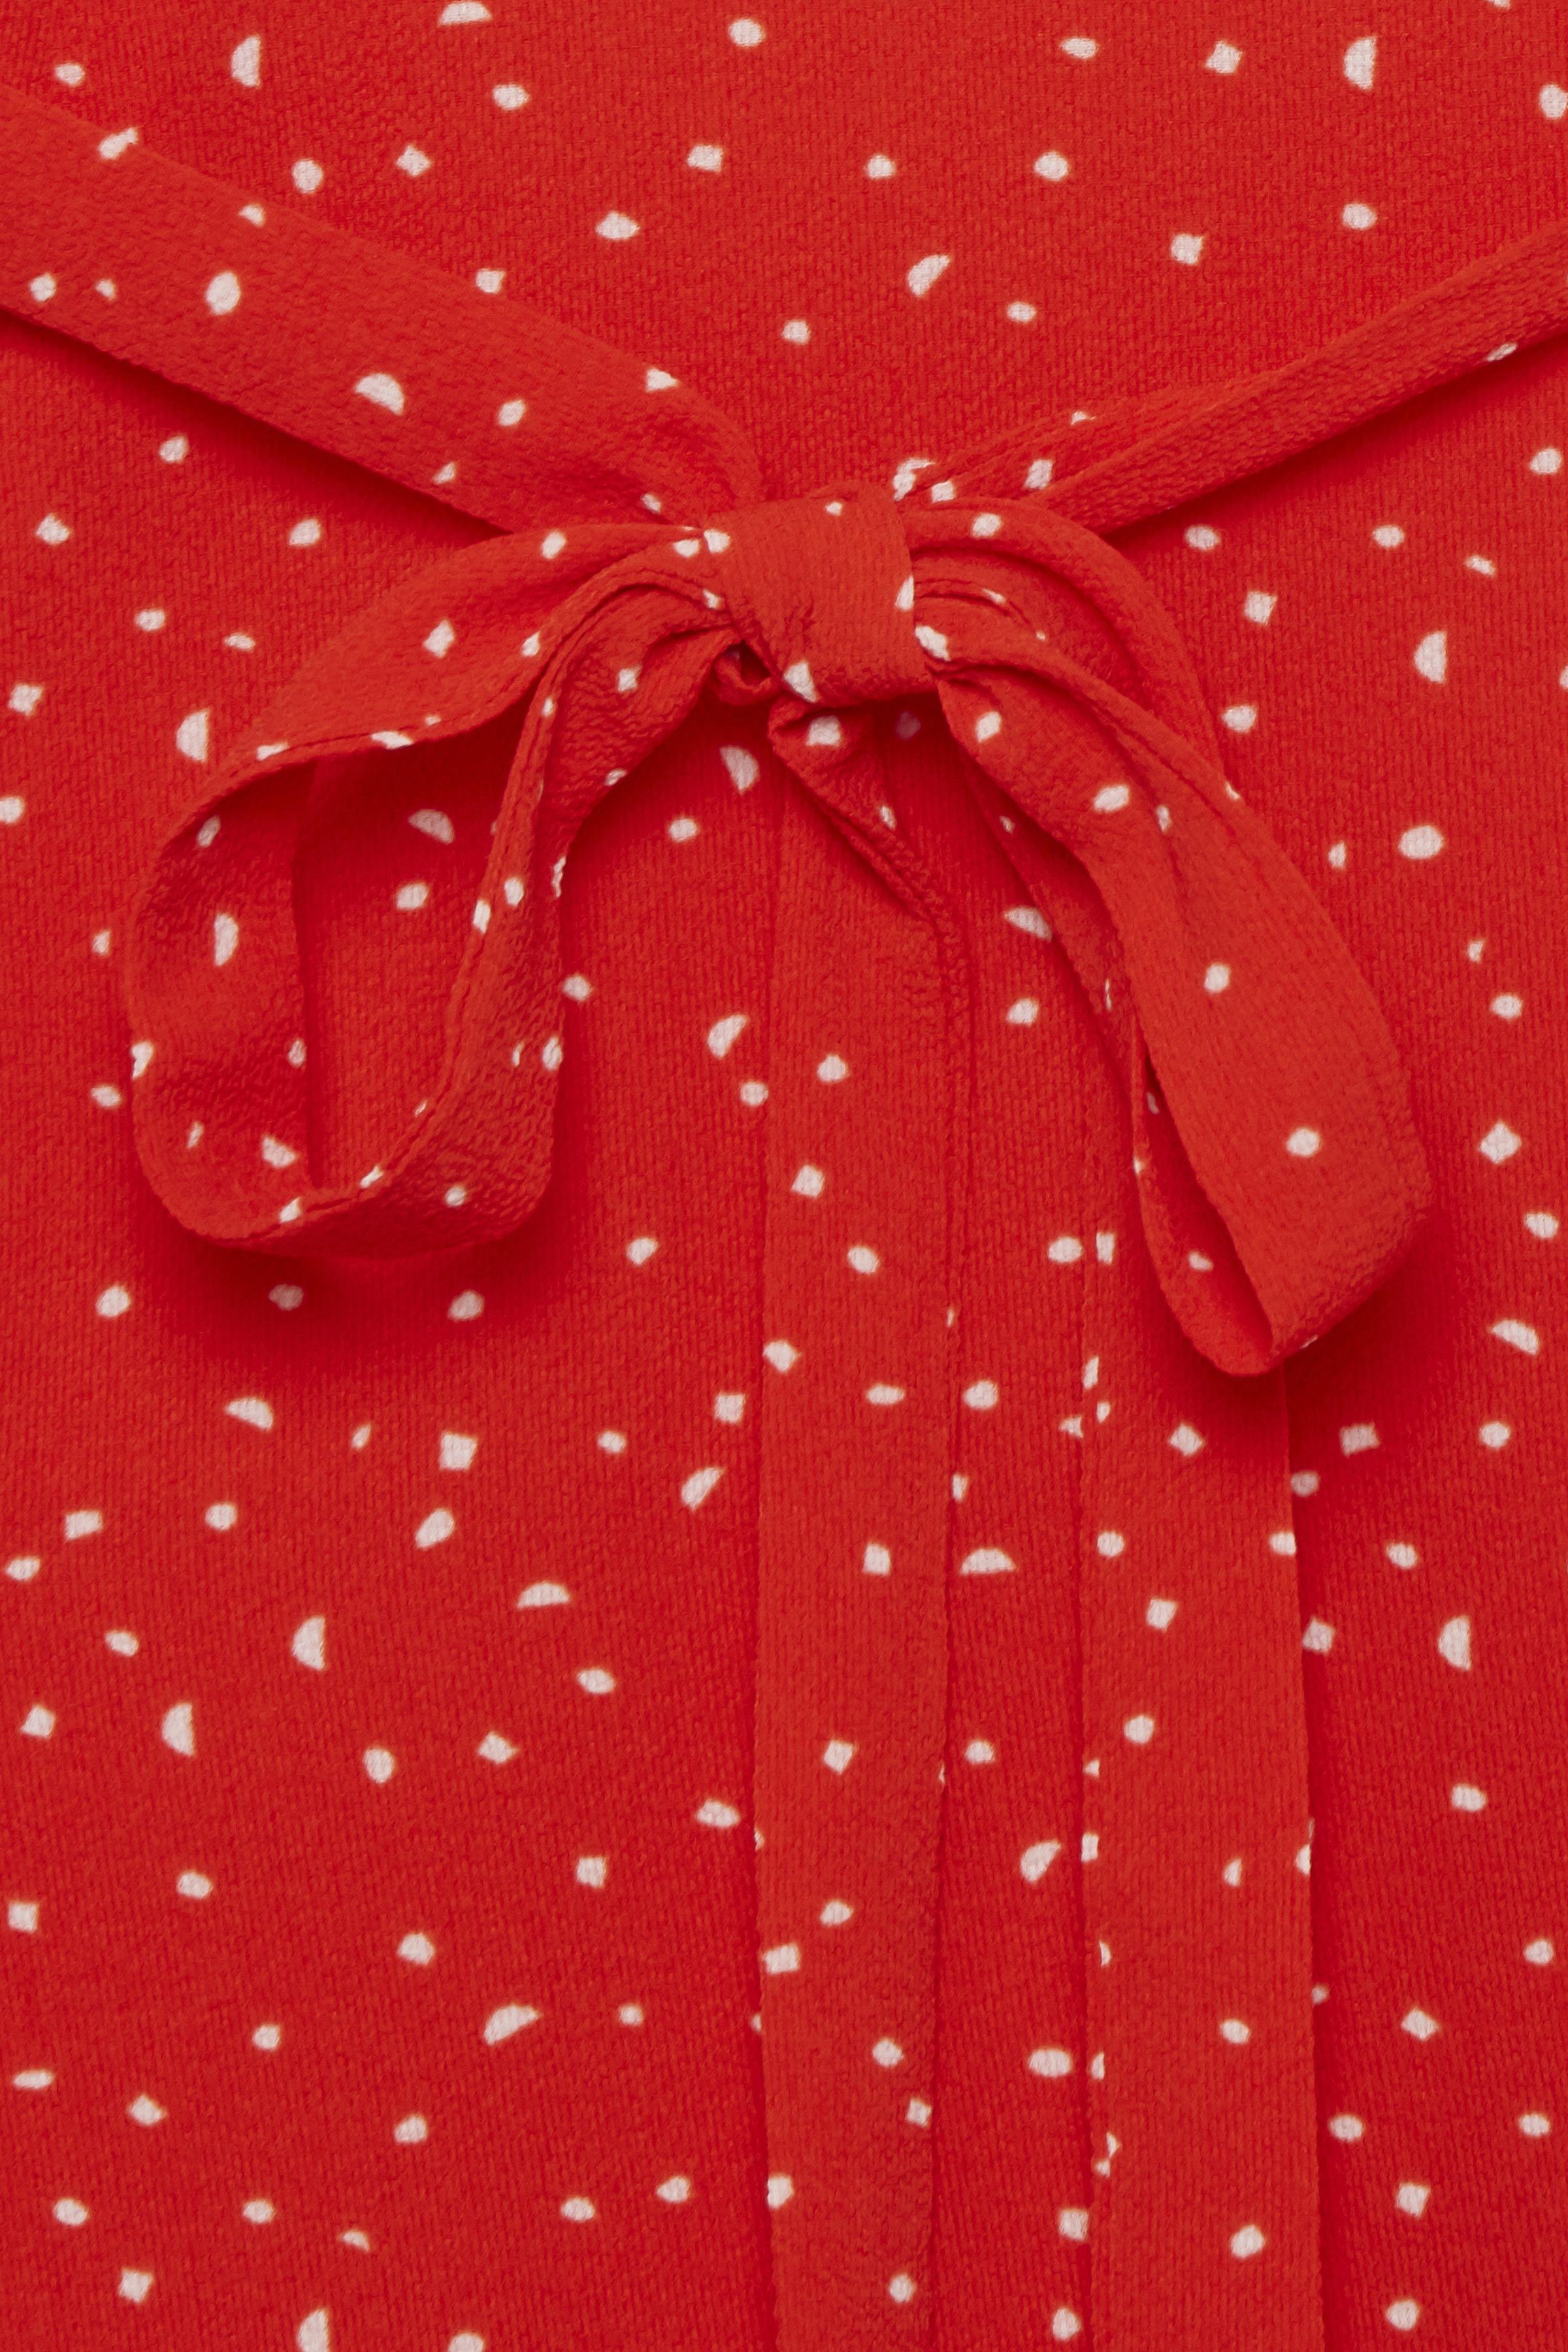 Poinciana Kjole – Køb Poinciana Kjole fra str. XS-XL her